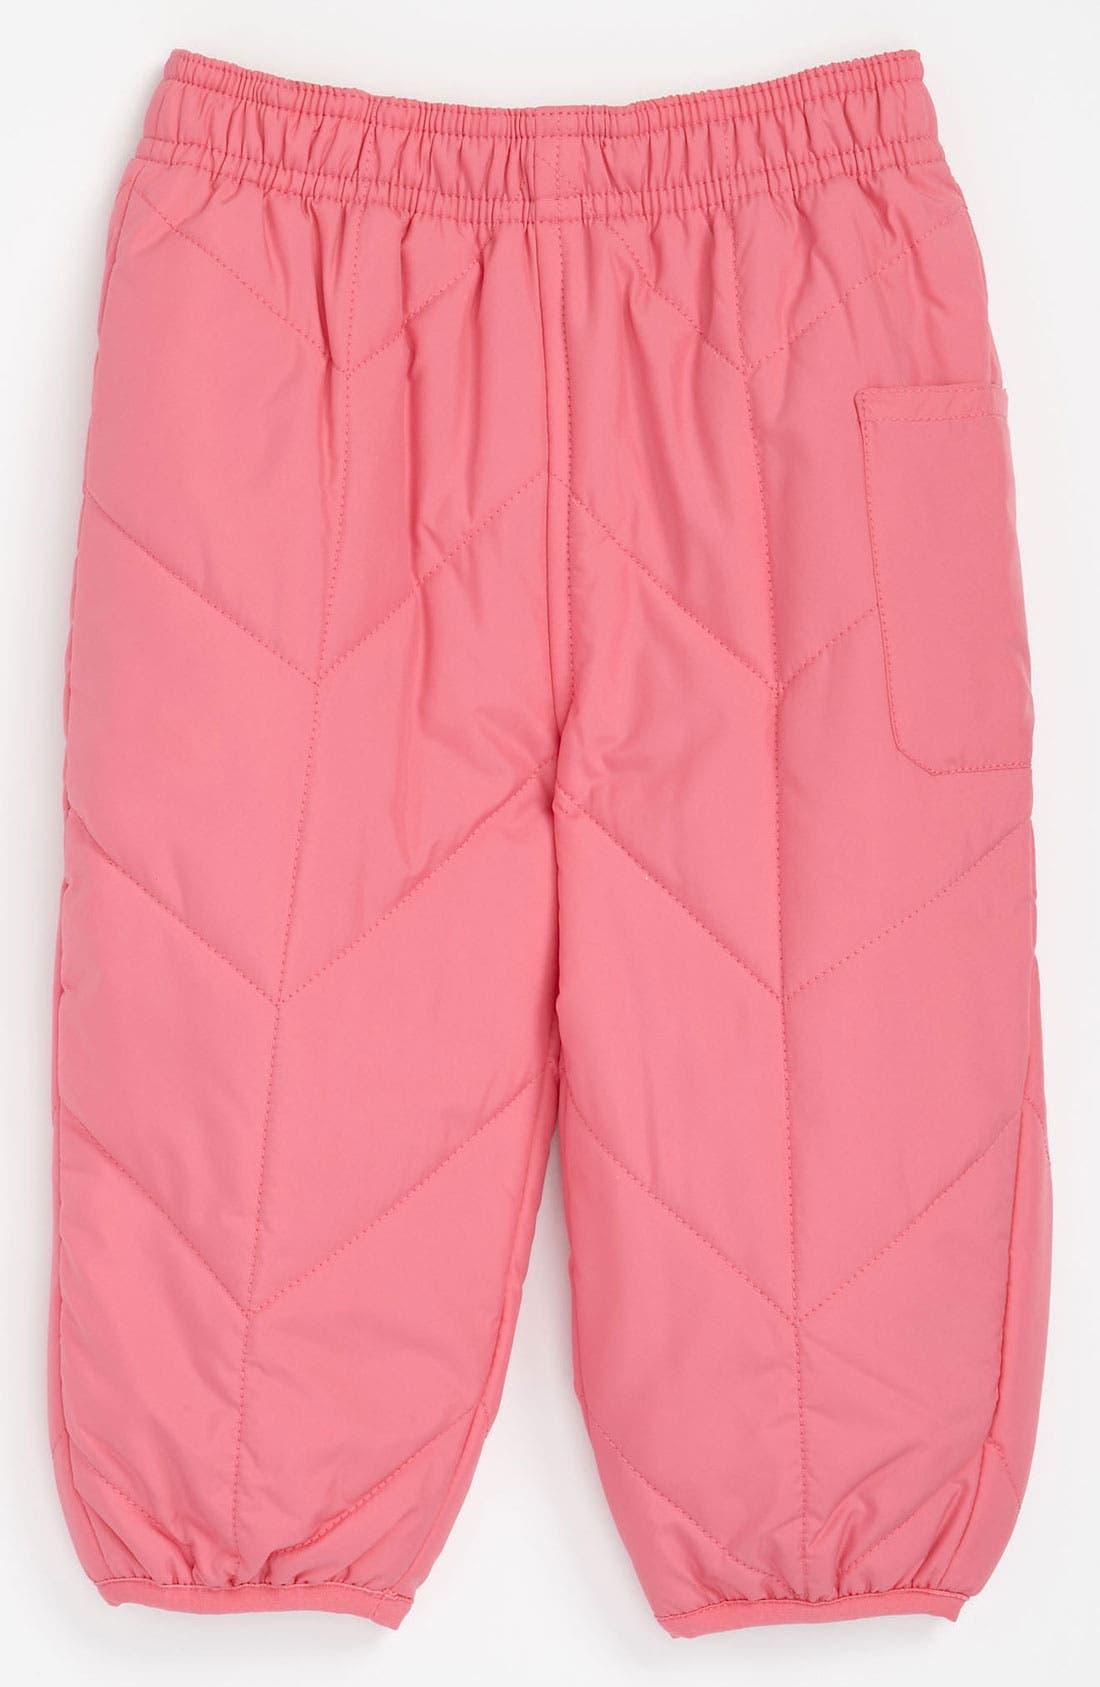 Main Image - The North Face 'Perrito' Reversible Pants (Baby)